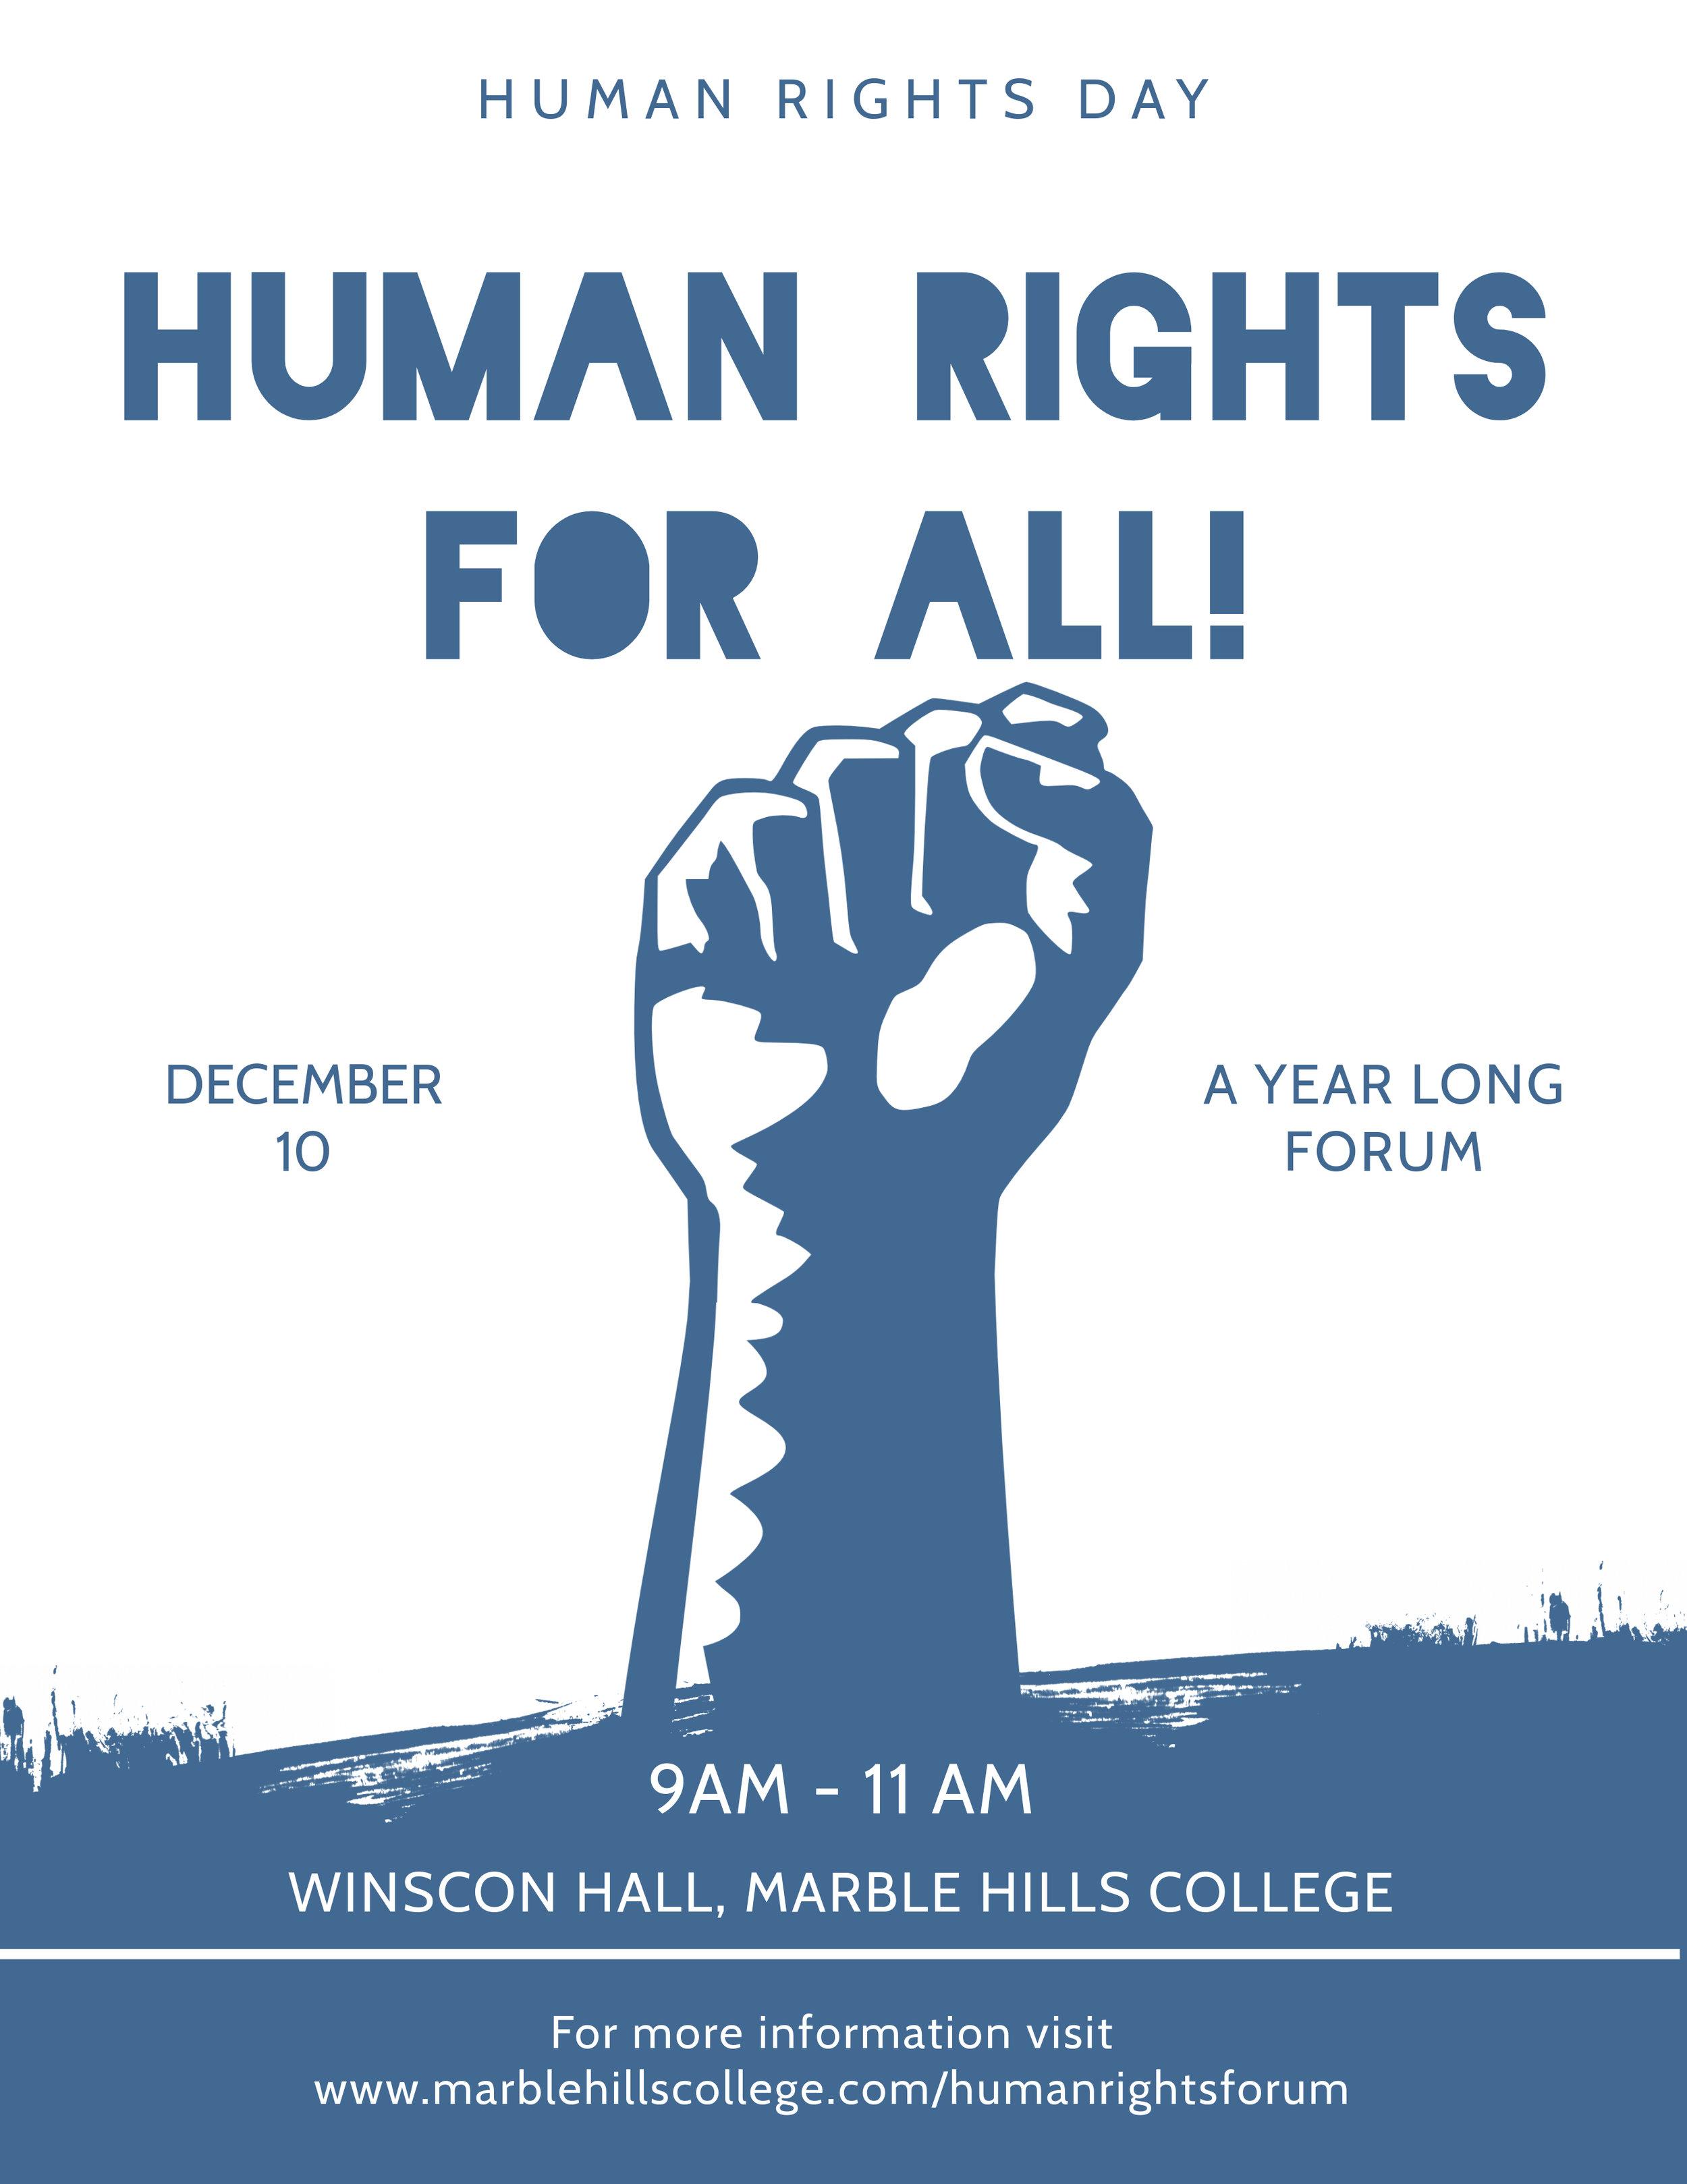 Copy of Civil Rights Propoganda Poster Template.jpg